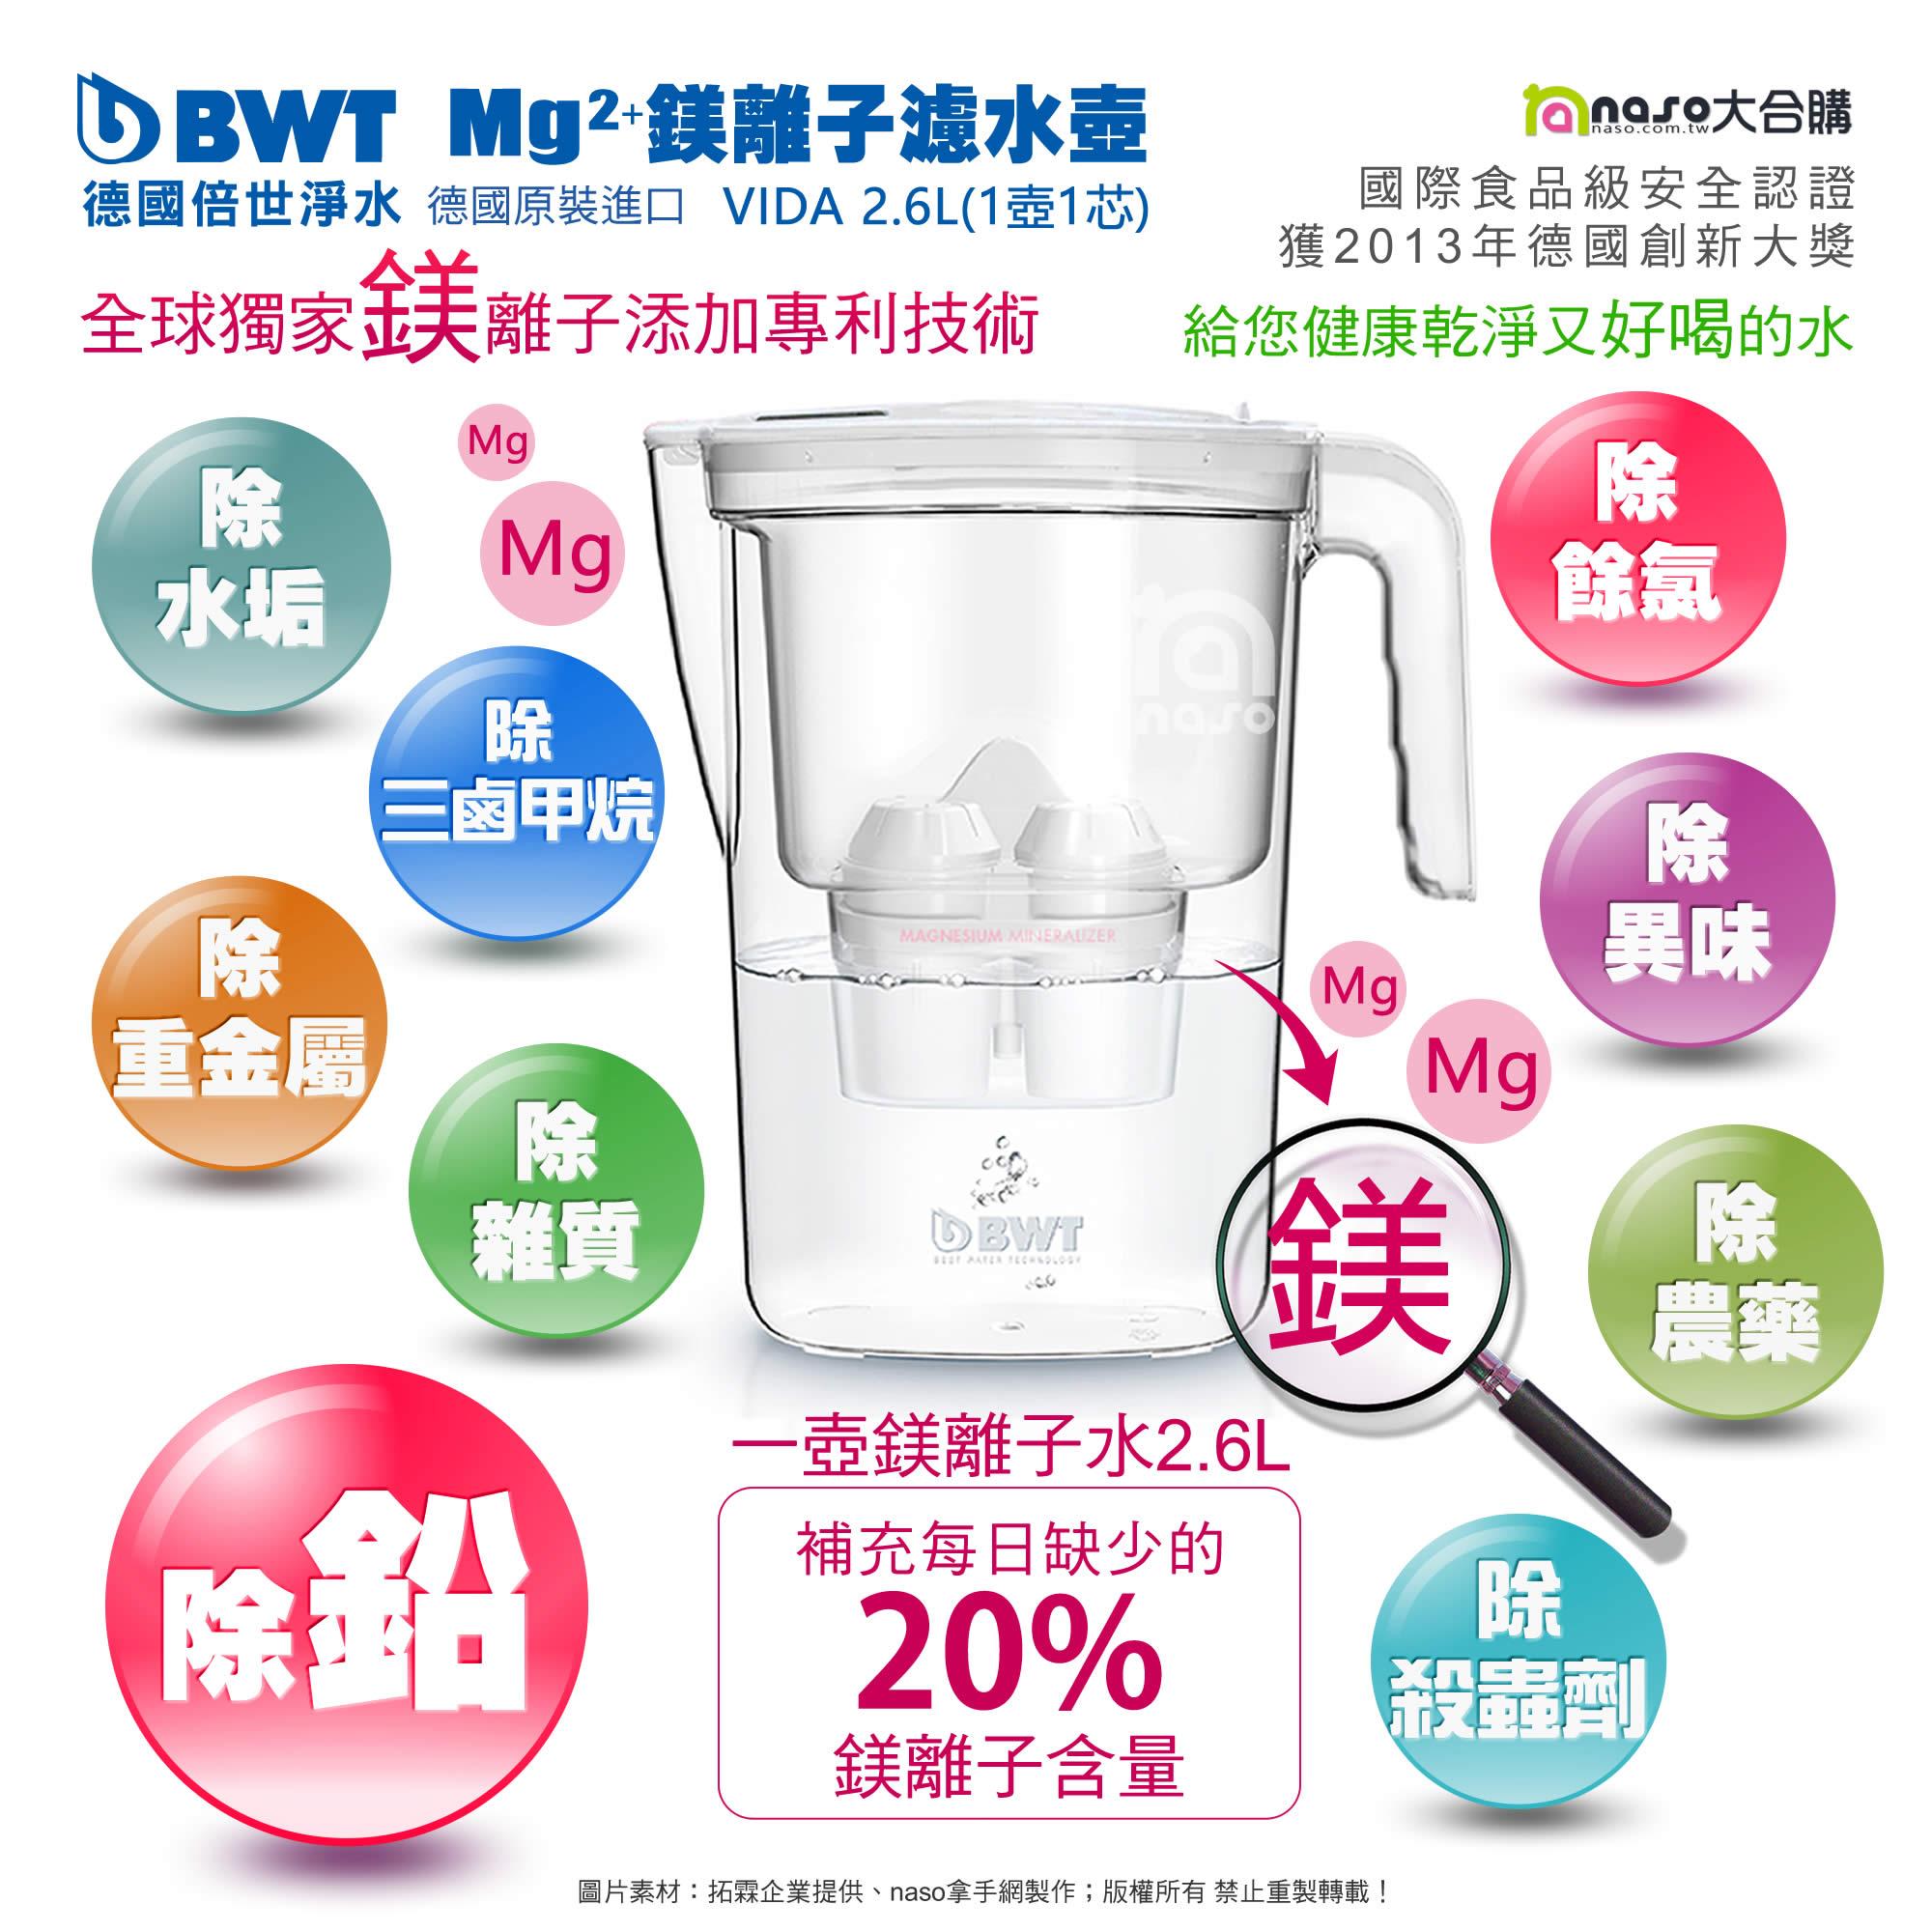 【BWT德國倍世】Mg2+鎂離子健康濾水壺 VIDA 2.6L 好評第7團